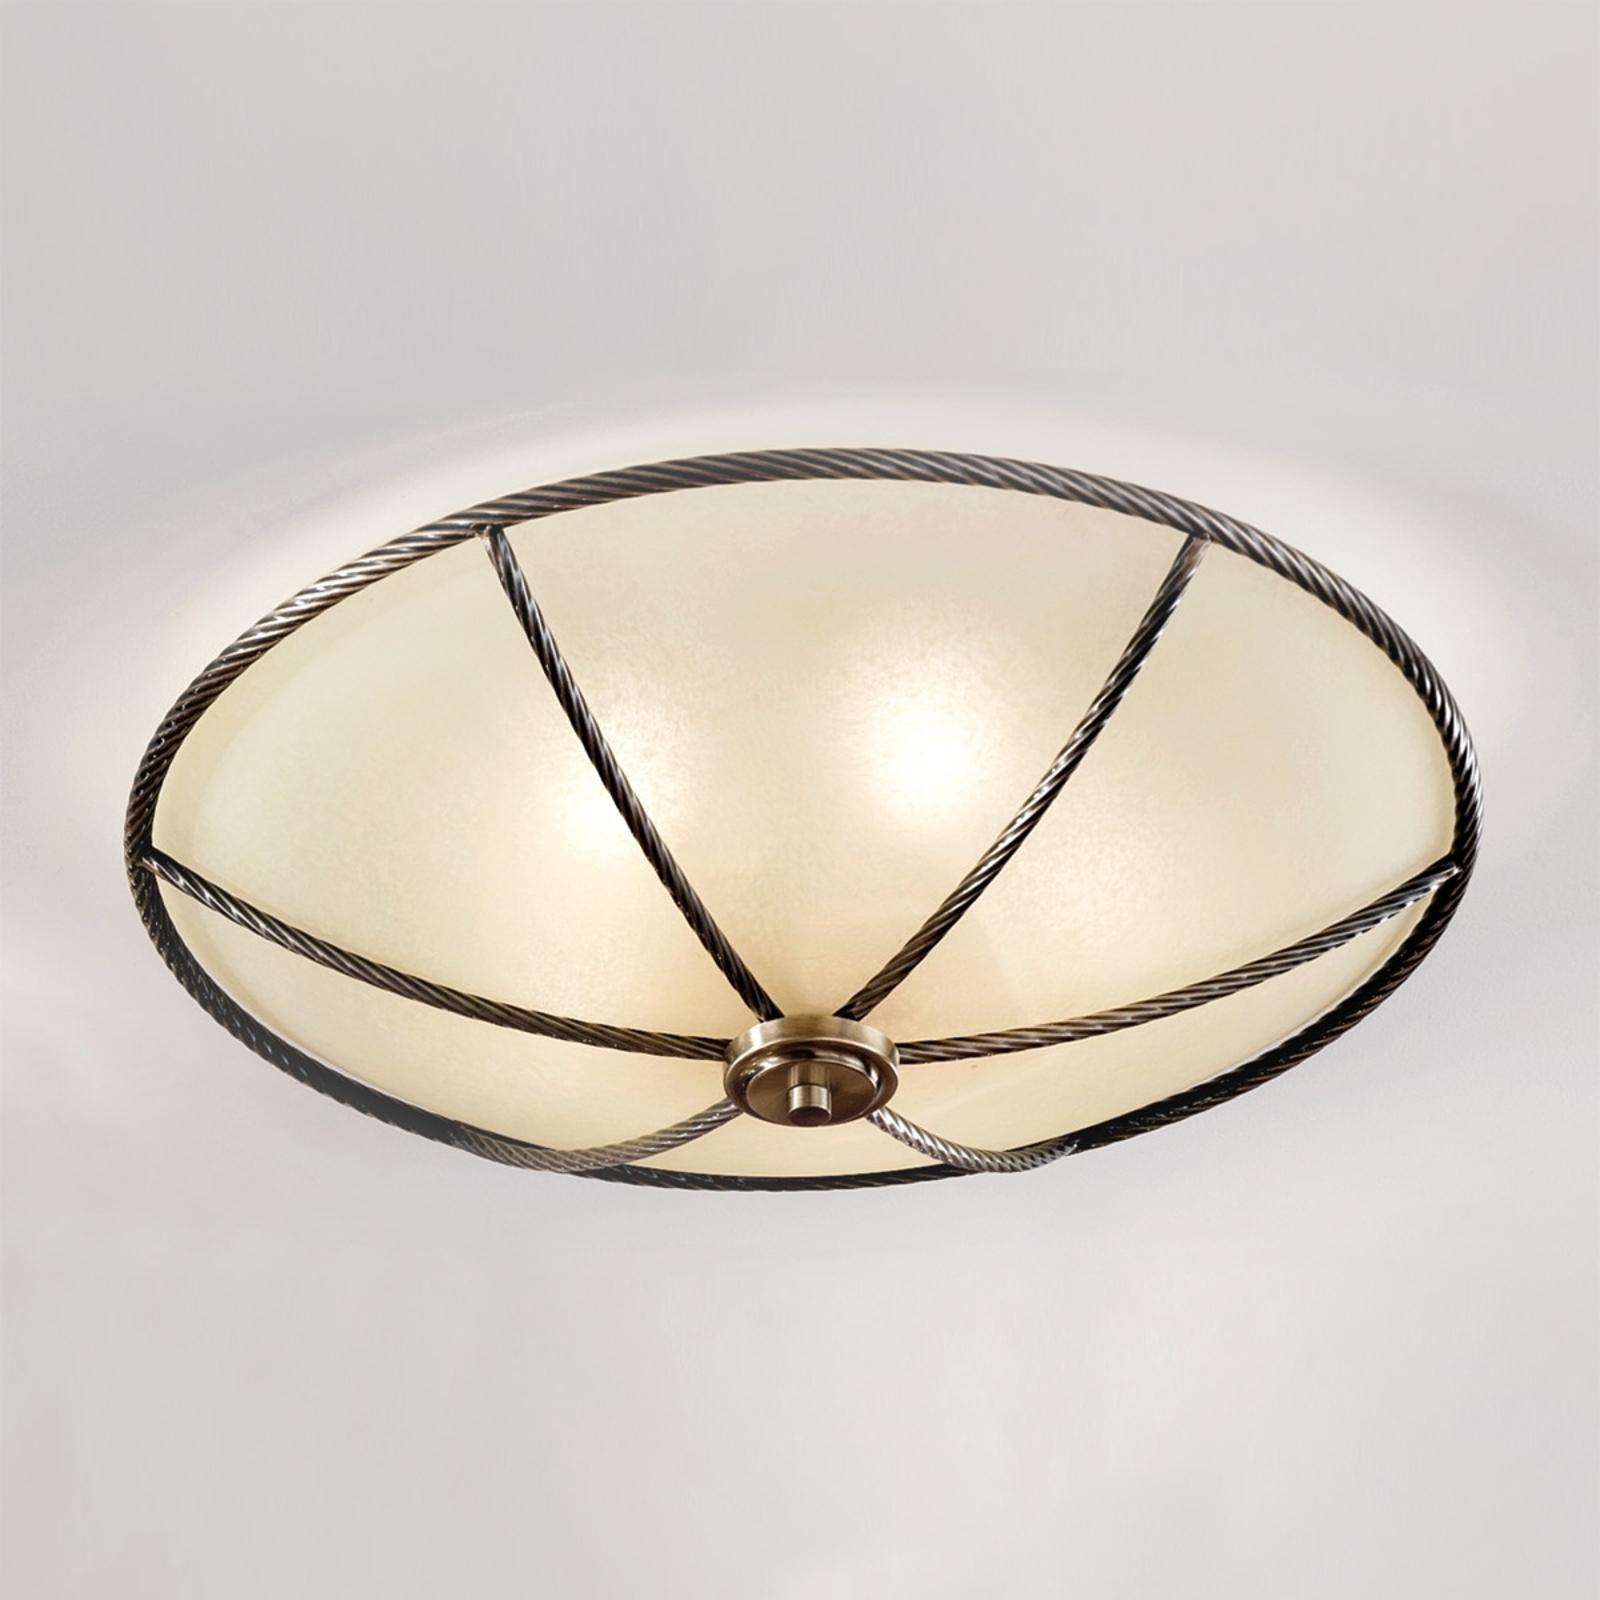 Lampa sufitowa kolor szampański Galina 56 cm